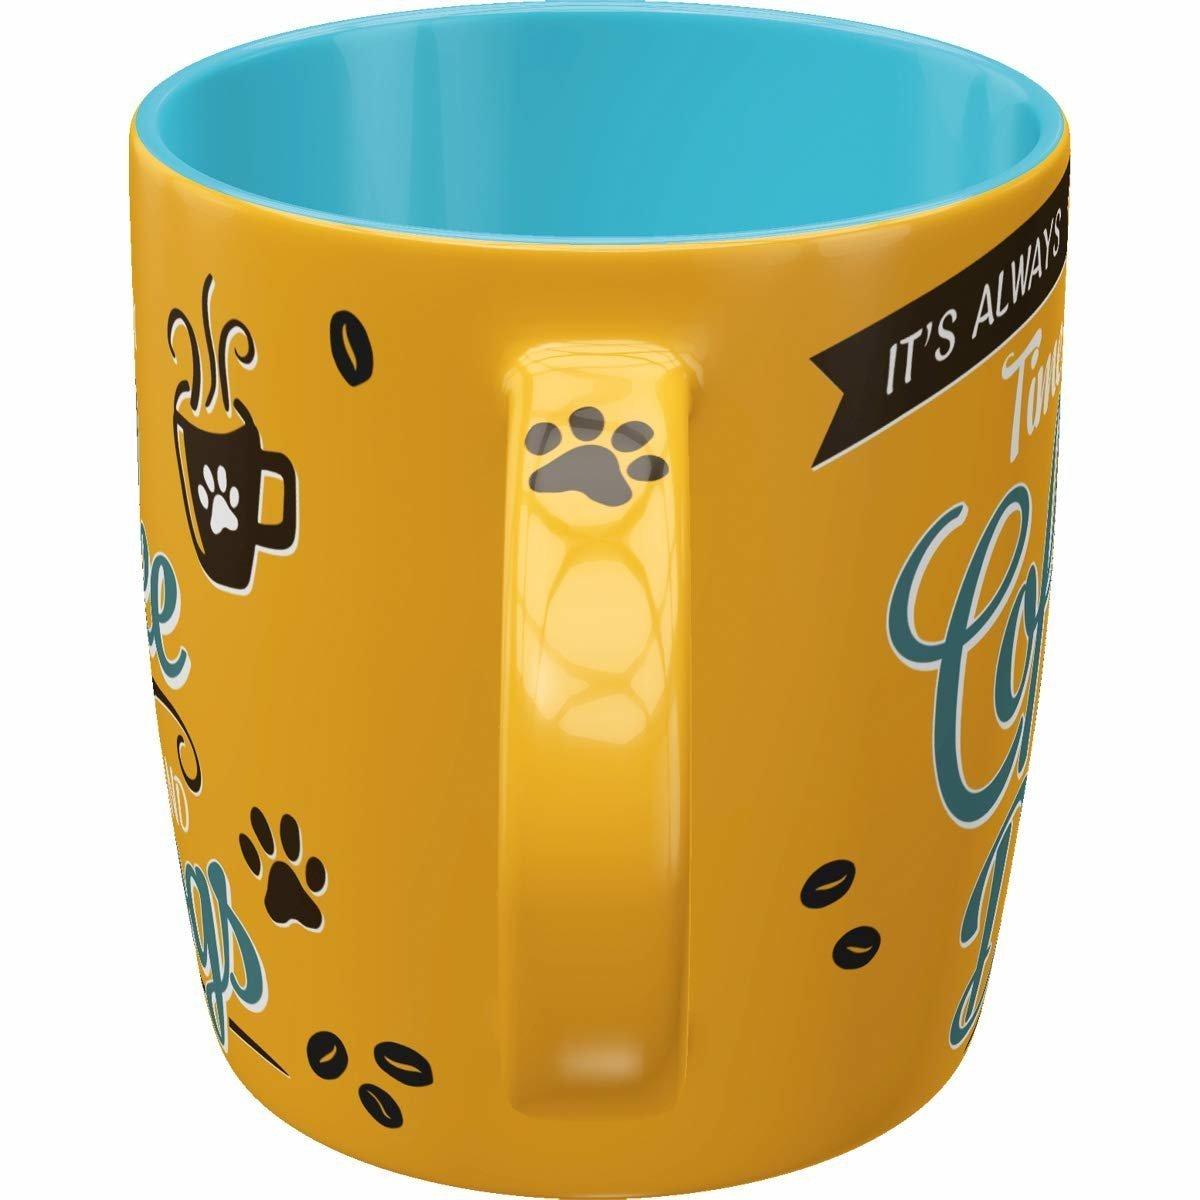 Nostalgic-Art Kaffebecher Coffee and Dogs, Bild 3